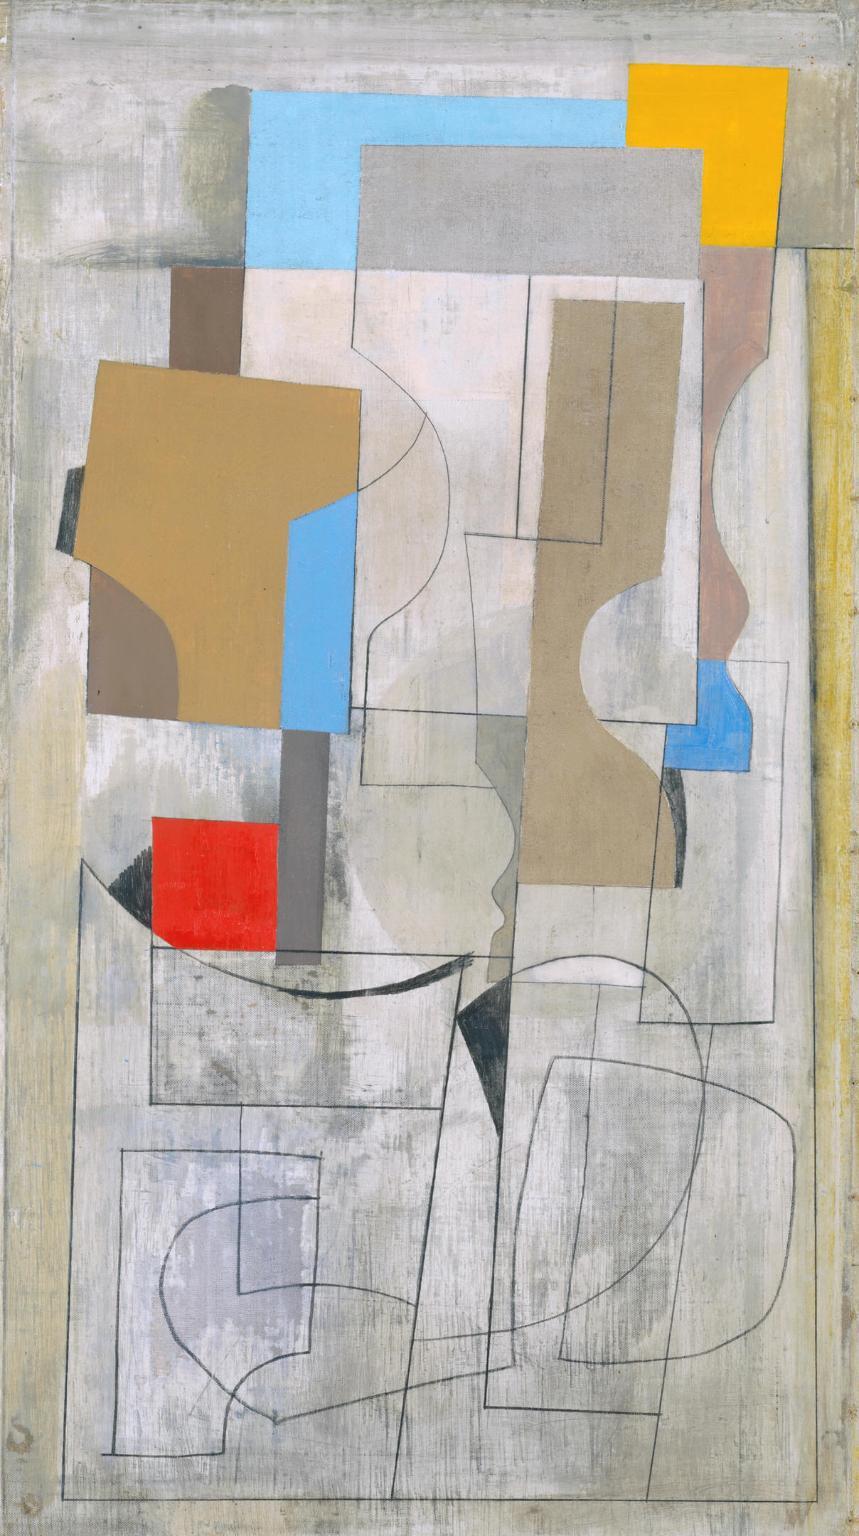 Feb 28-53 (vertical seconds) 1953 Ben Nicholson OM 1894-1982